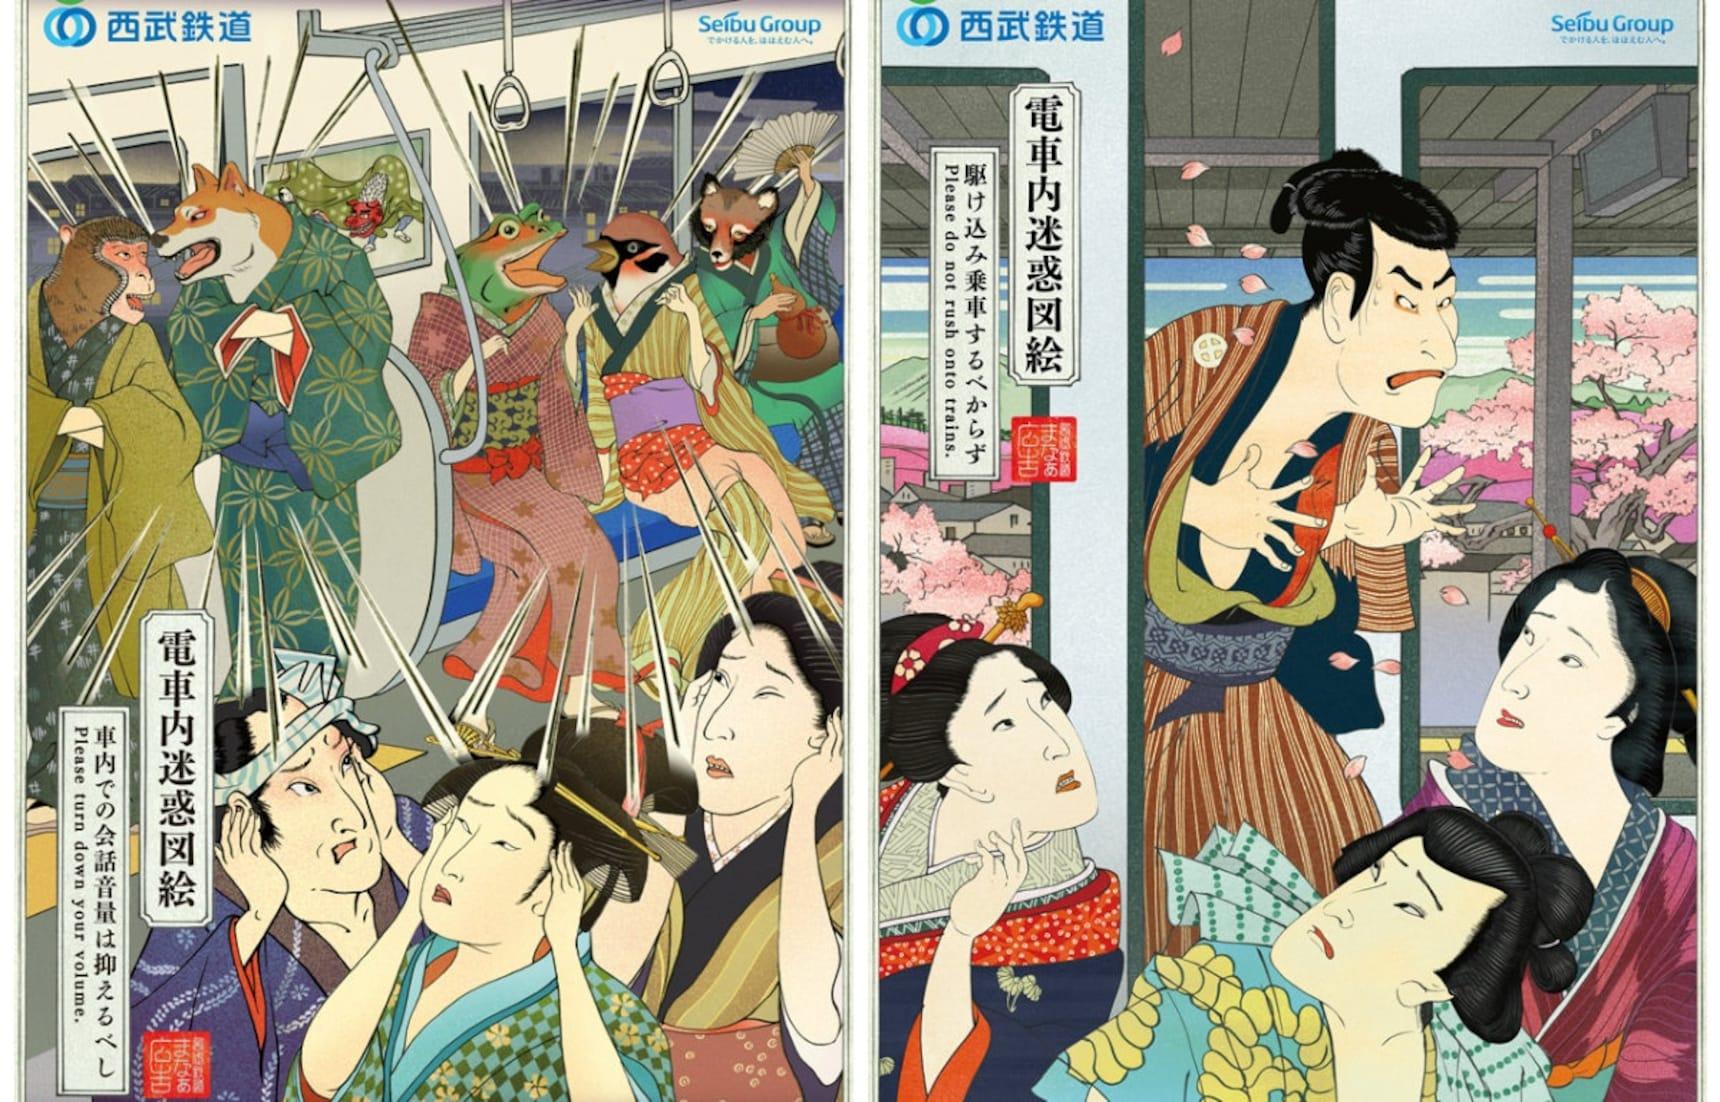 'Ukiyo-e' Teach Passengers Train Etiquette